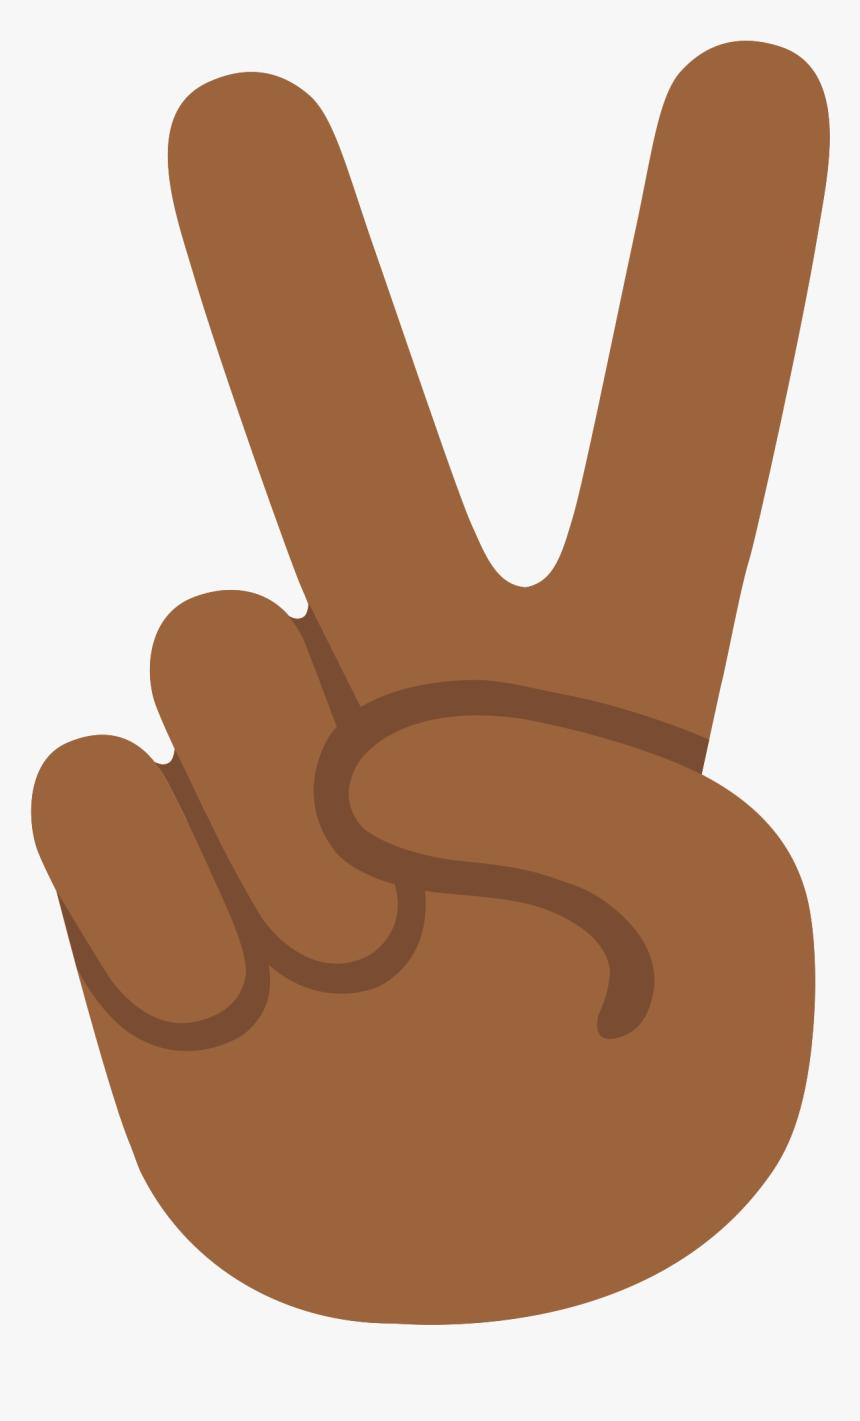 Emoji U270c 1f3fe - Peace Sign Hand Emoji Png, Transparent Png, Free Download